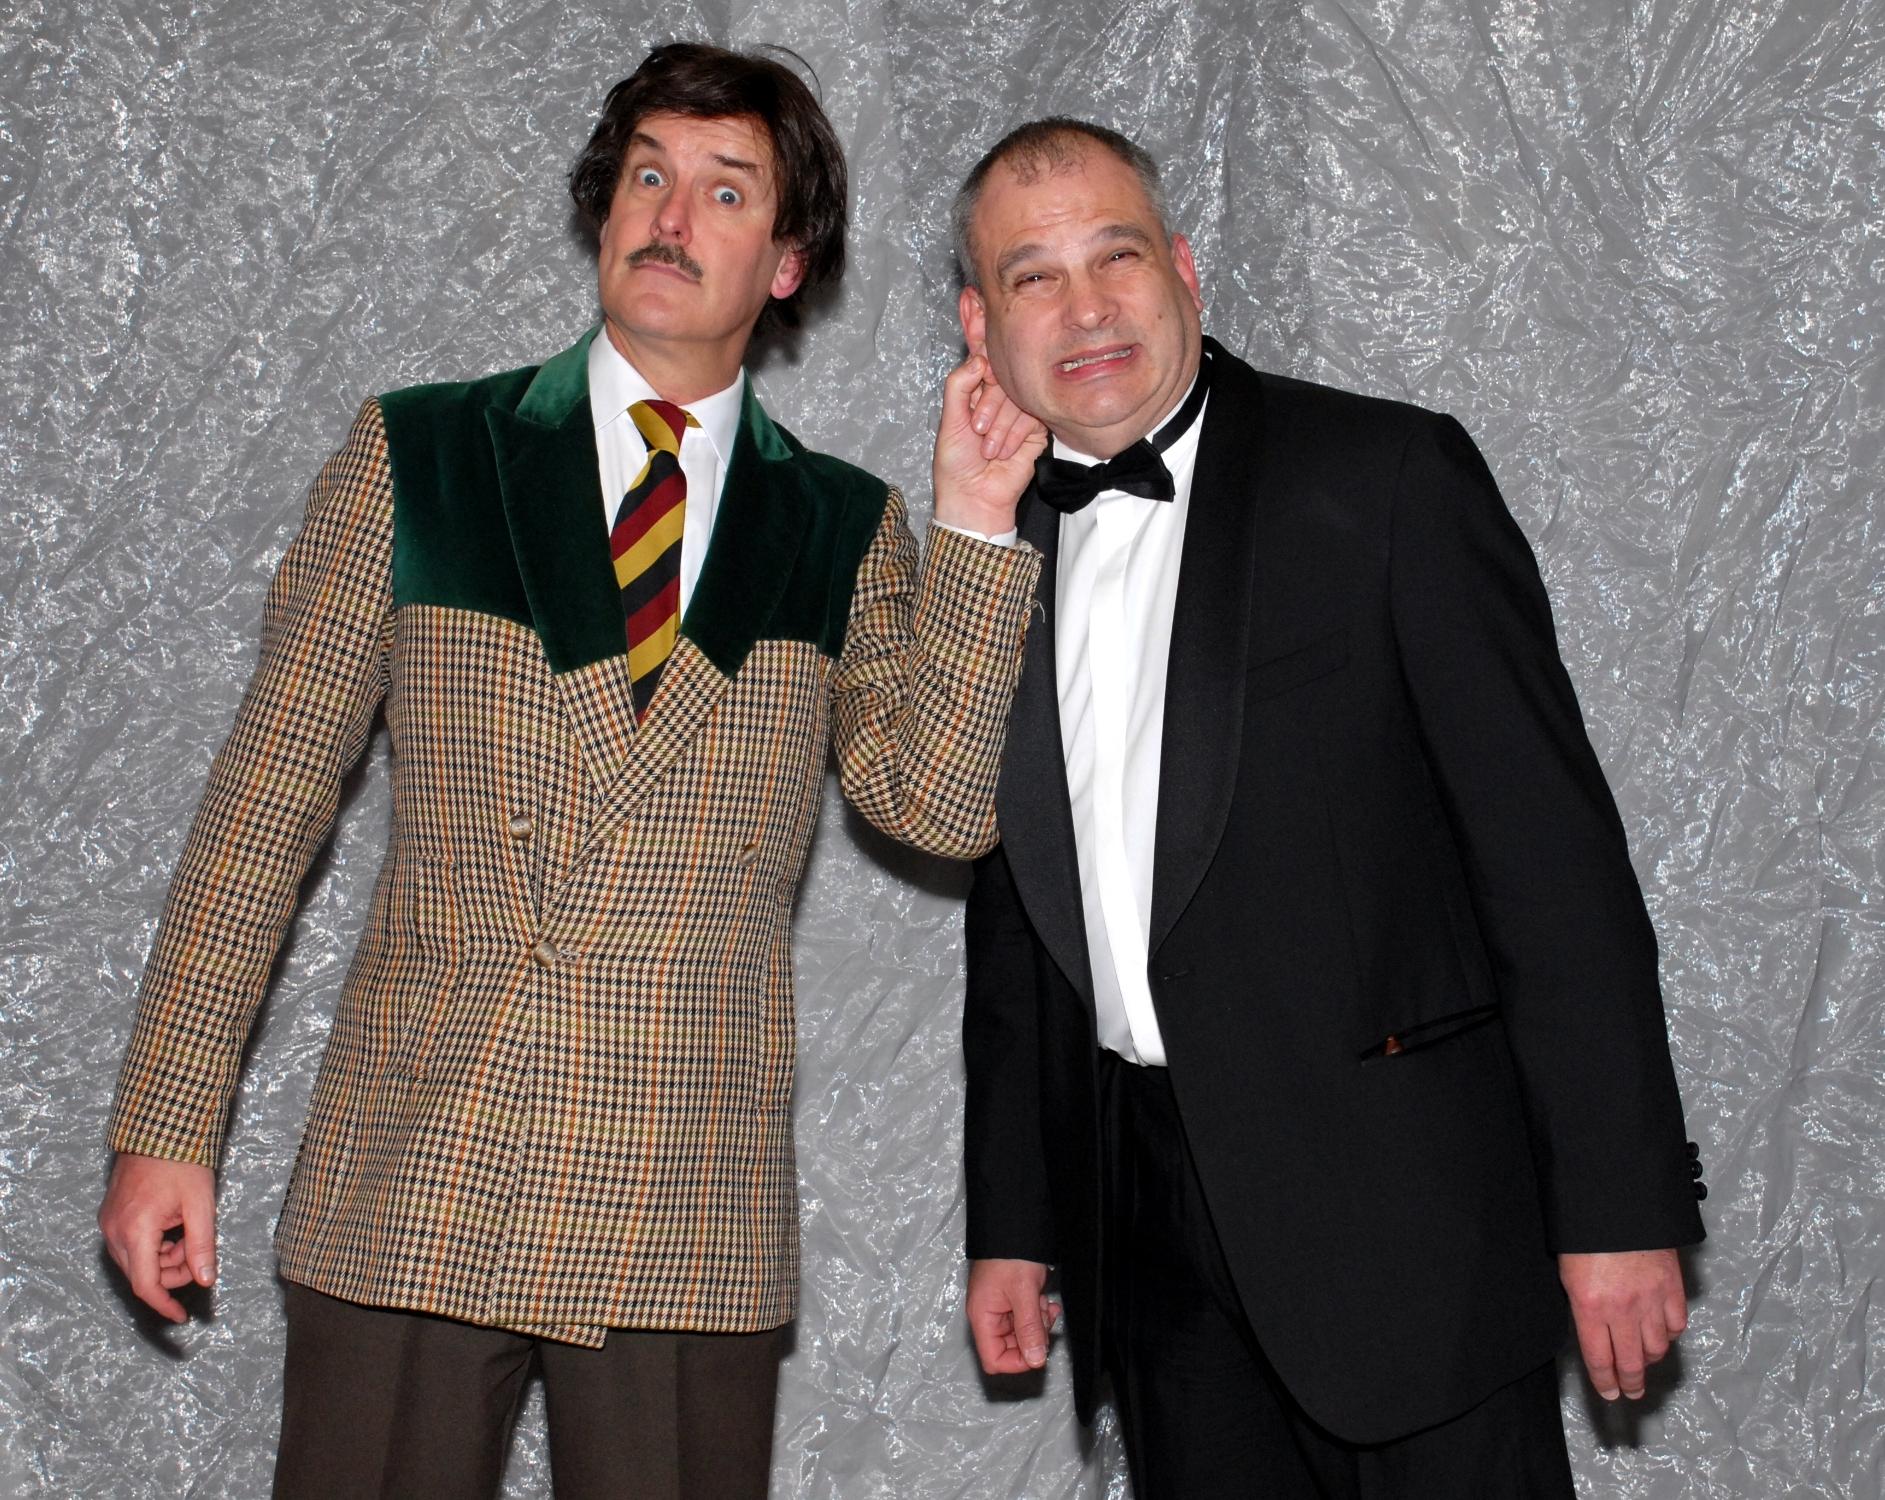 Me-and-Cleese-Lookalike